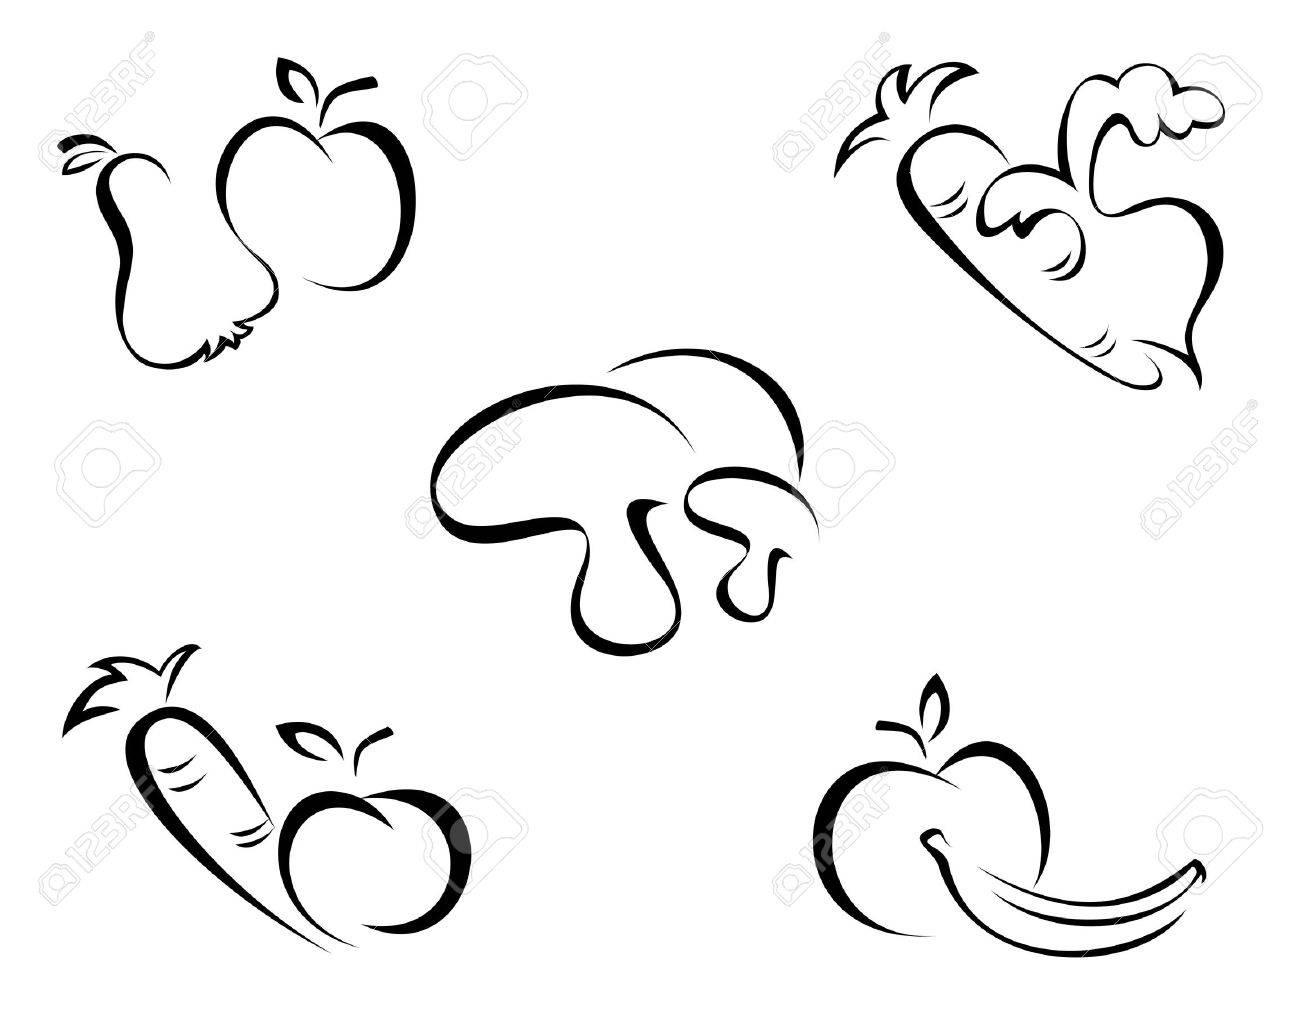 Vegetables symbols Stock Vector - 6350883